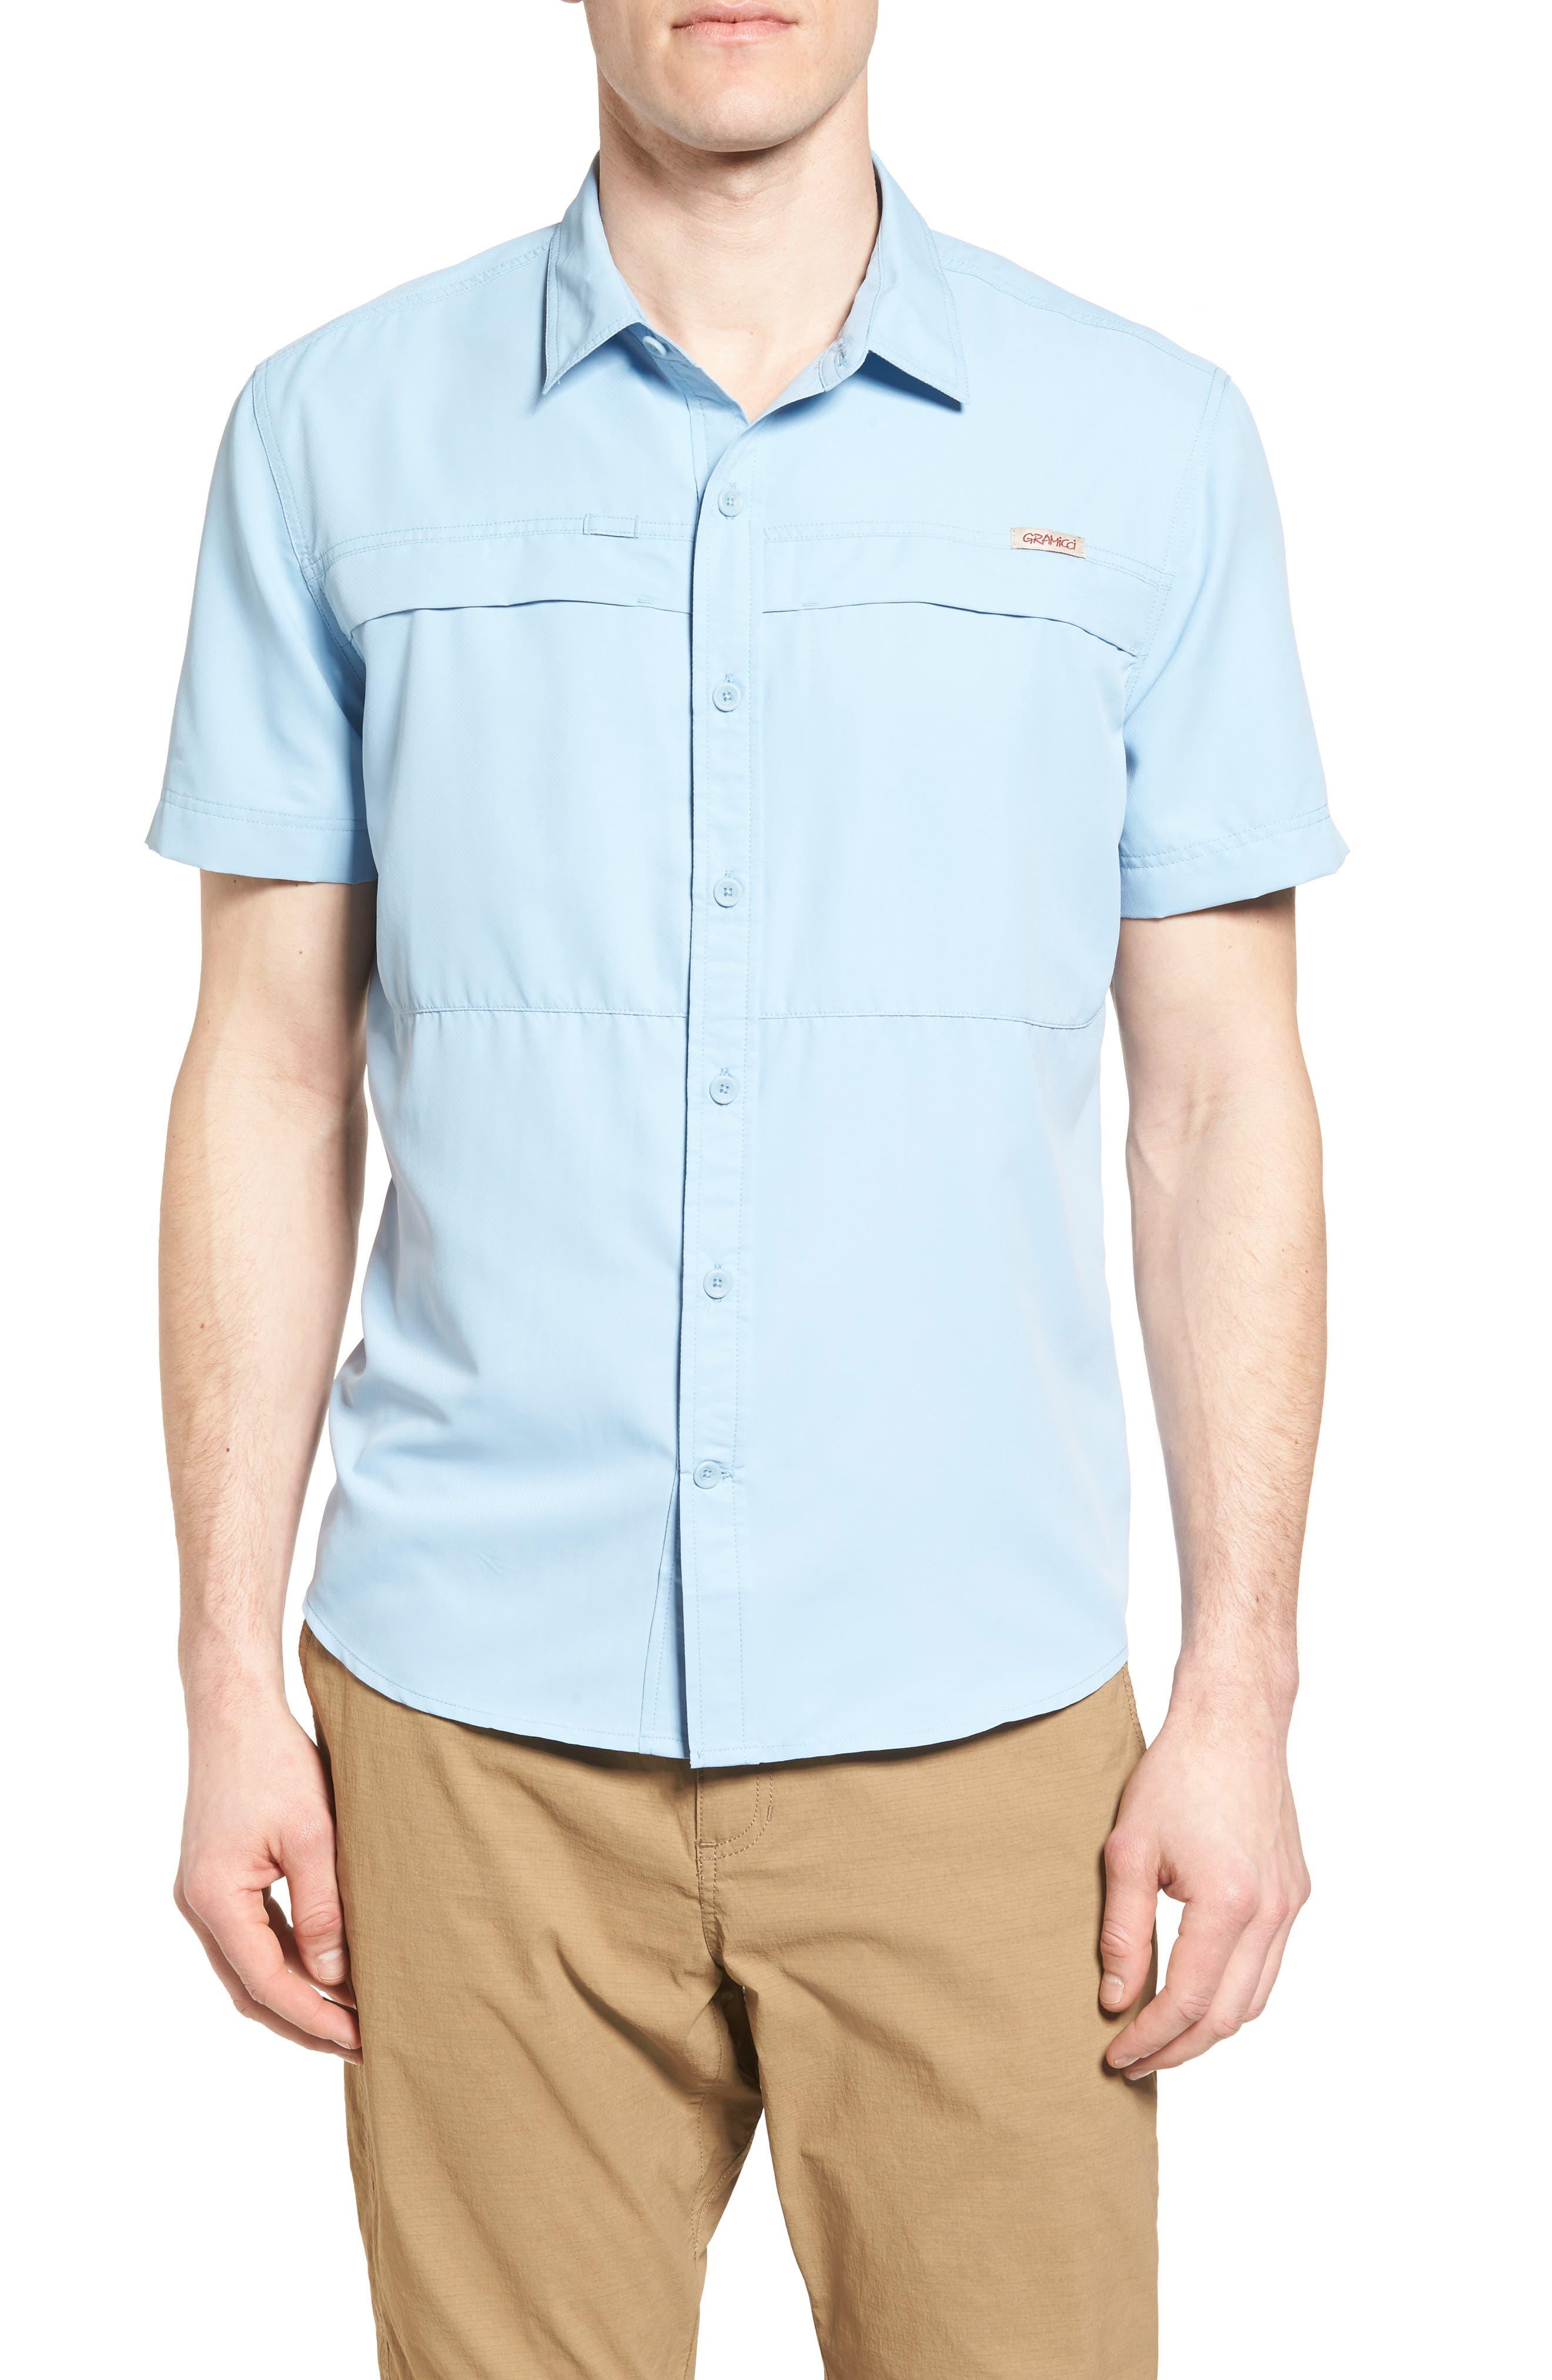 Alternate Image 1 Selected - Gramicci Pescador Tech Shirt